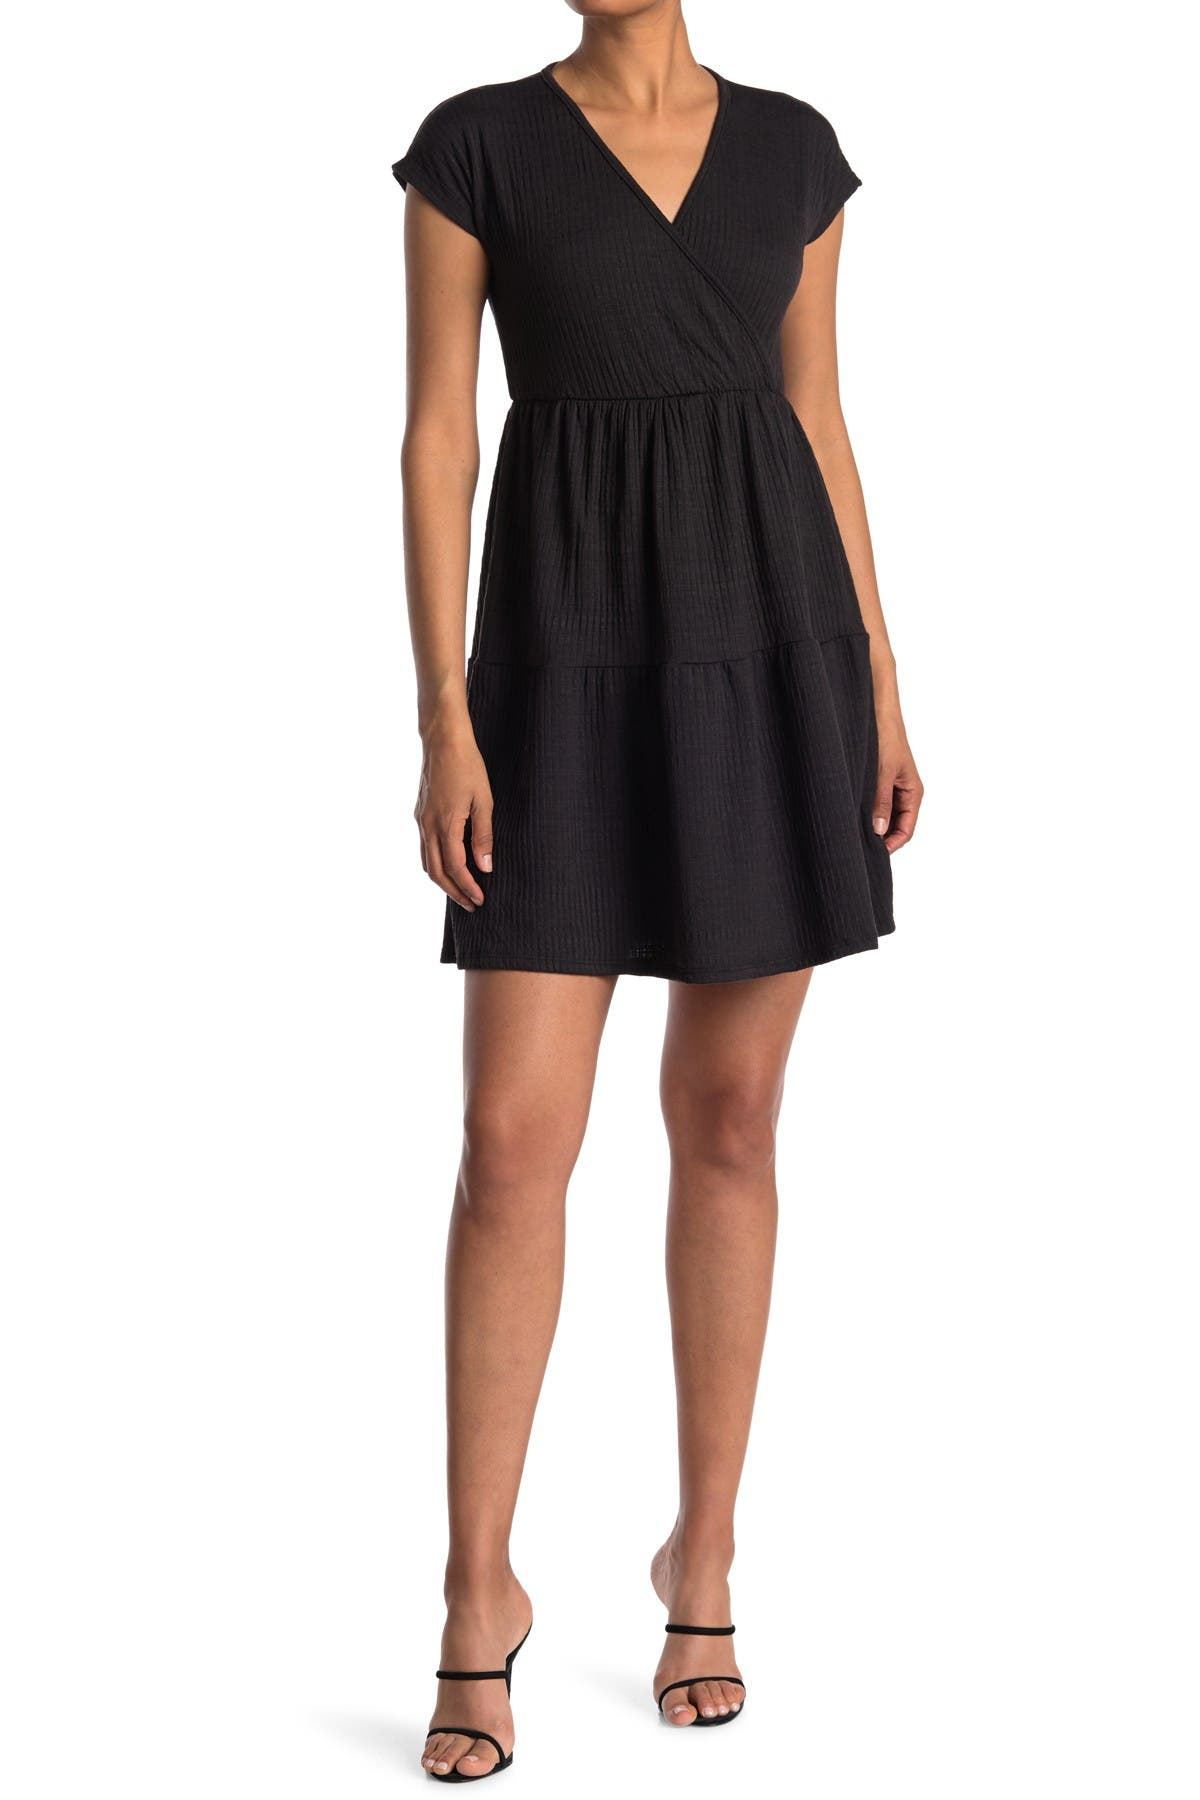 Image of Velvet Torch Ribbed Textured Flare Dress